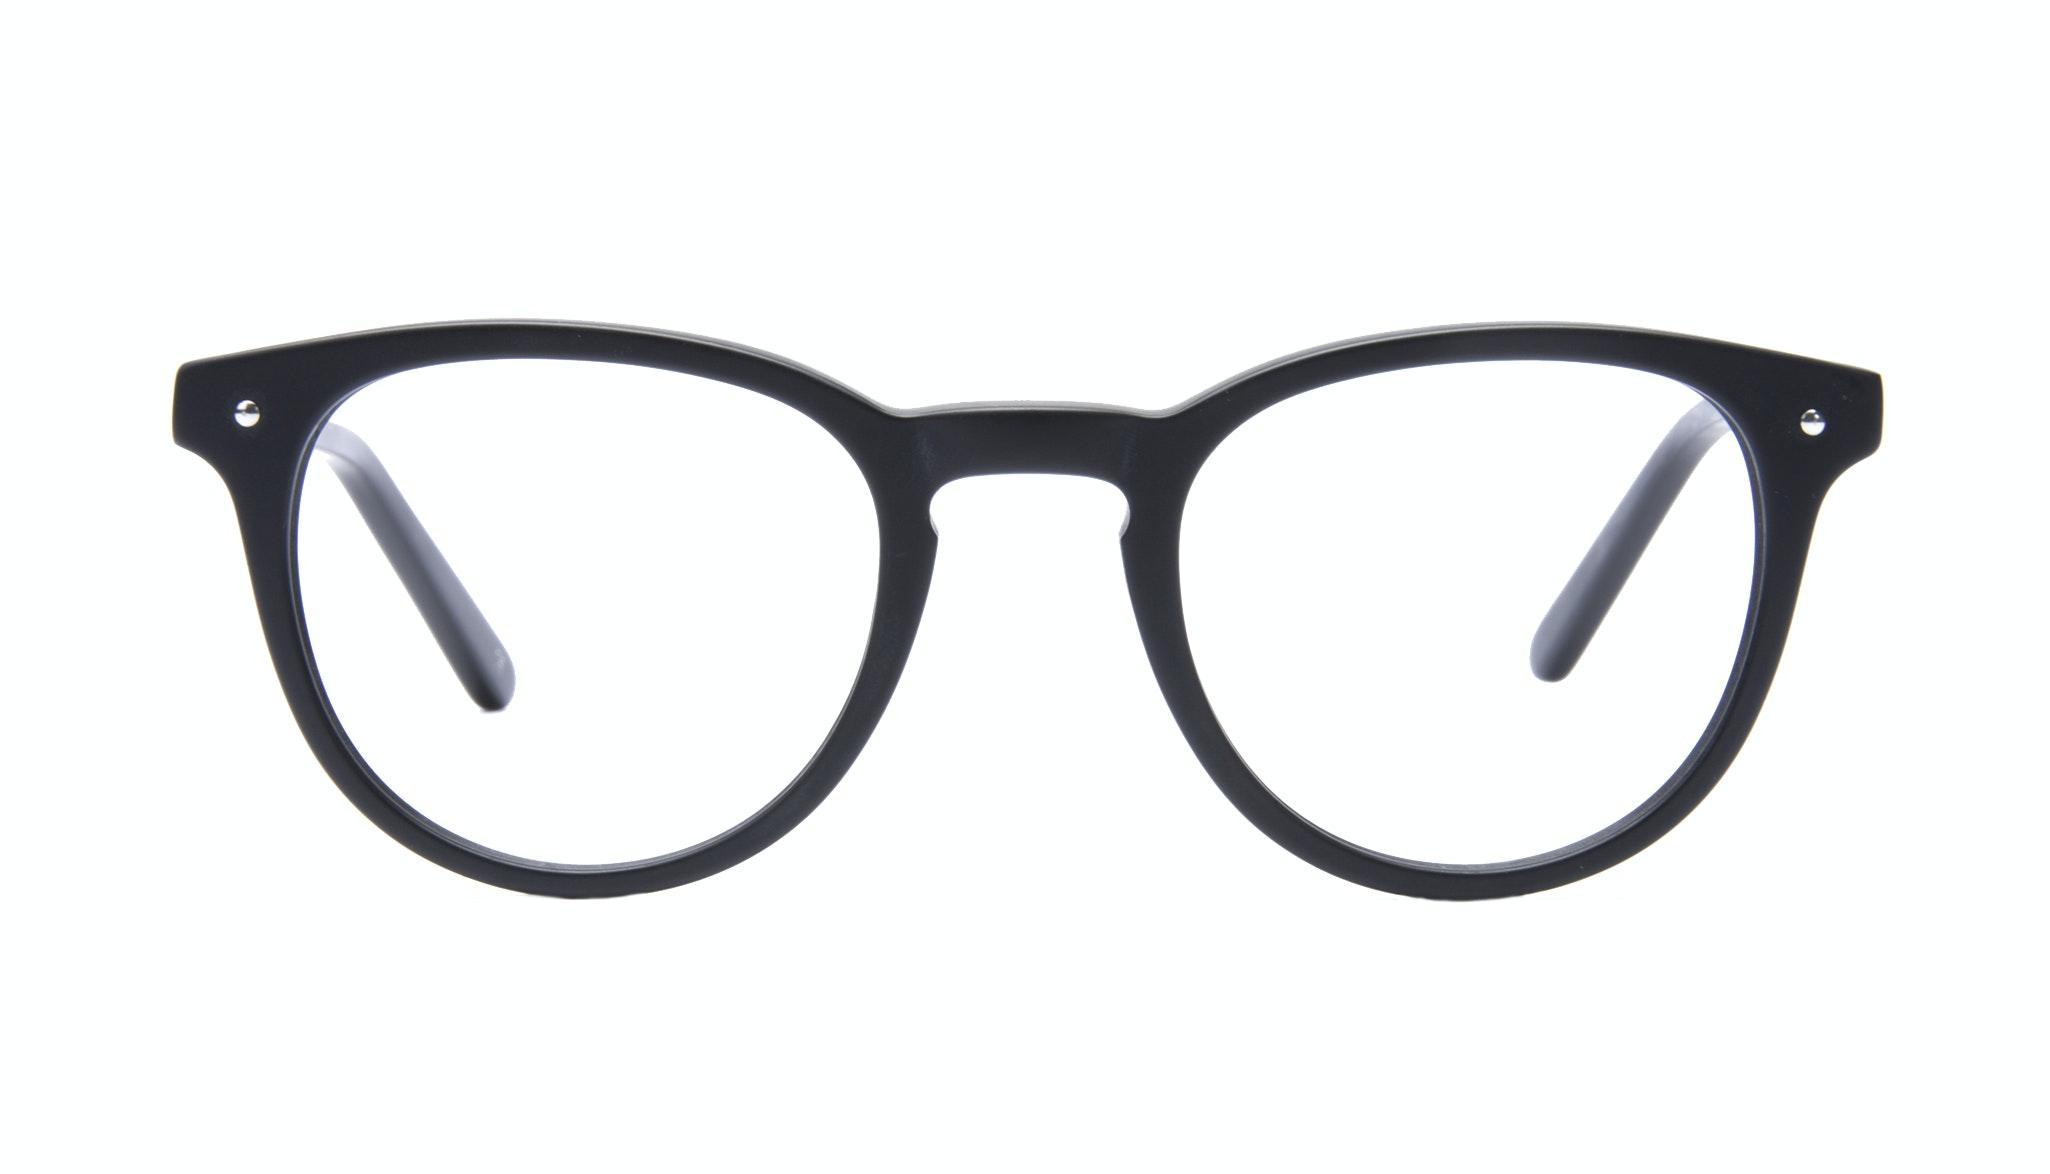 Affordable Fashion Glasses Round Eyeglasses Men Cult Matt Black